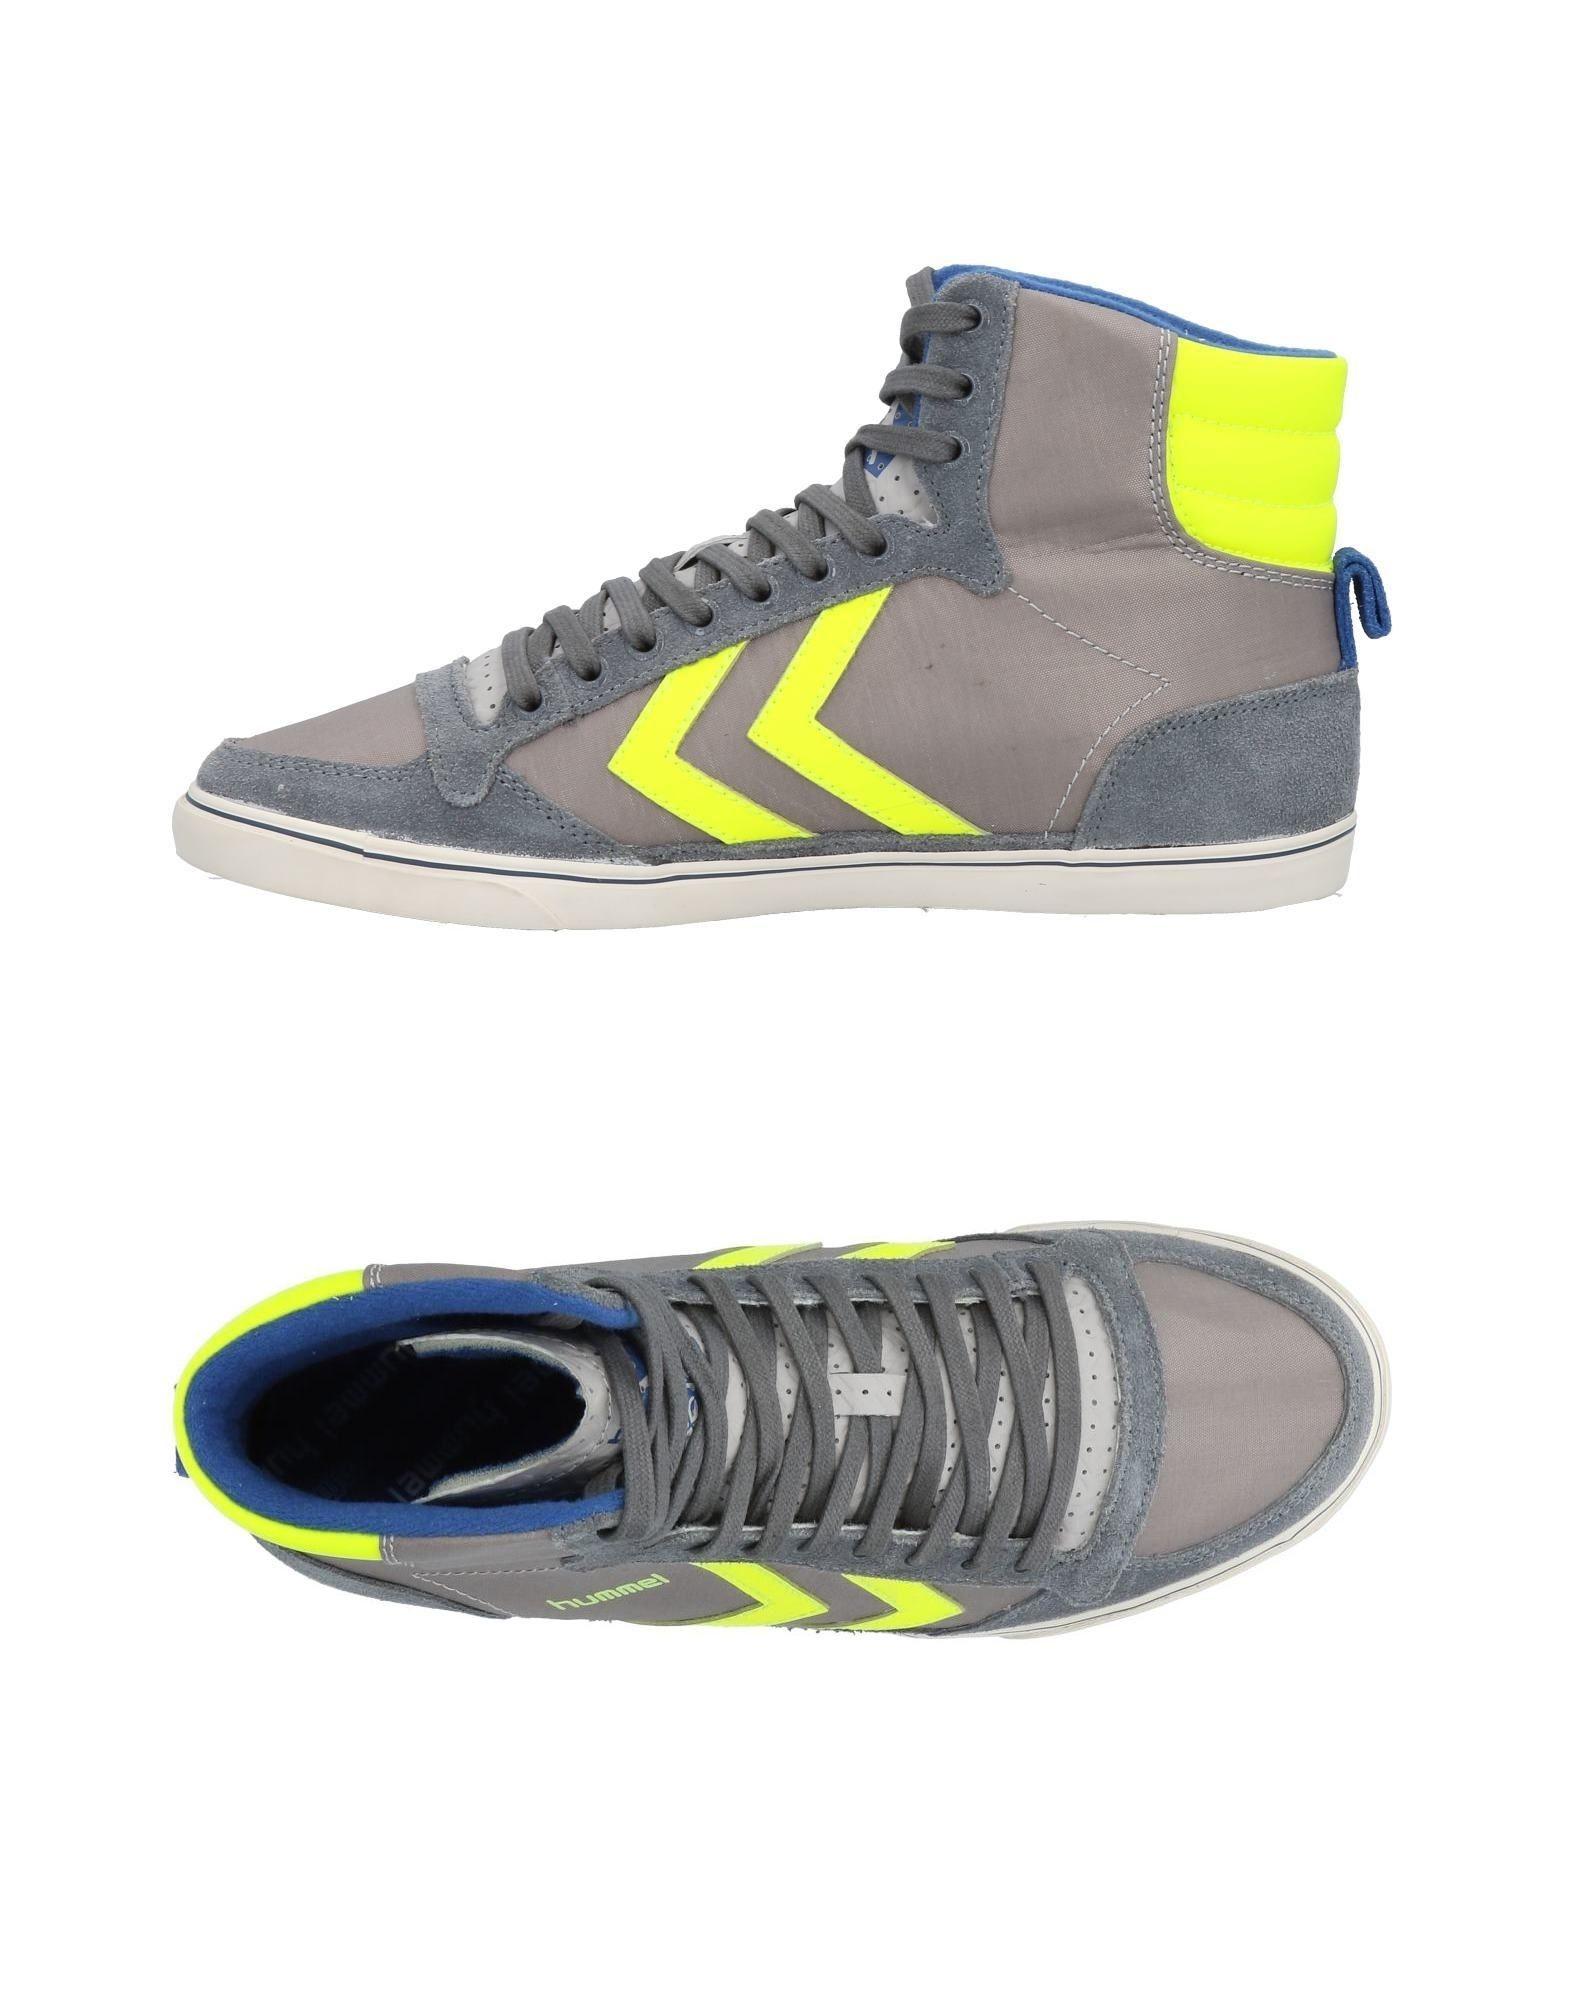 11488777KD Hummel Sneakers Herren  11488777KD  b8c8b5